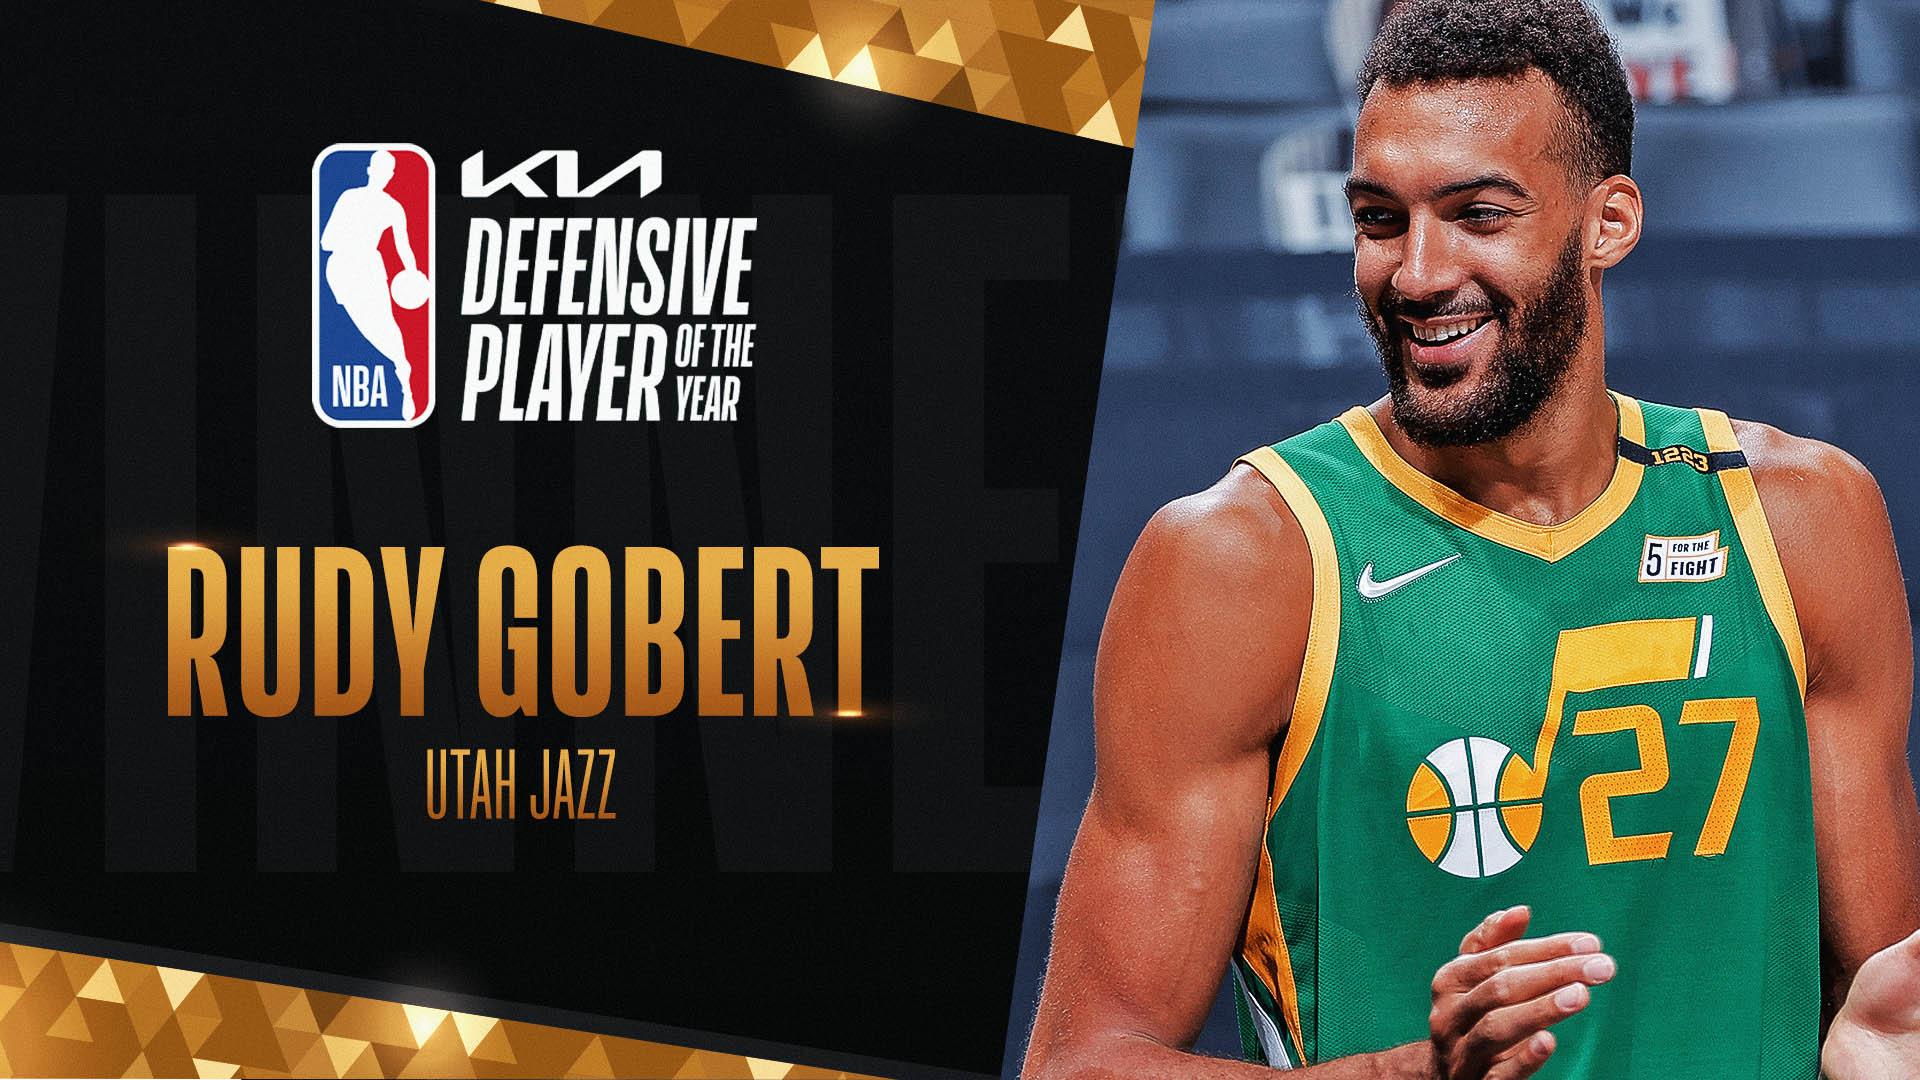 NBA Defensive Player of the Year Award Winners